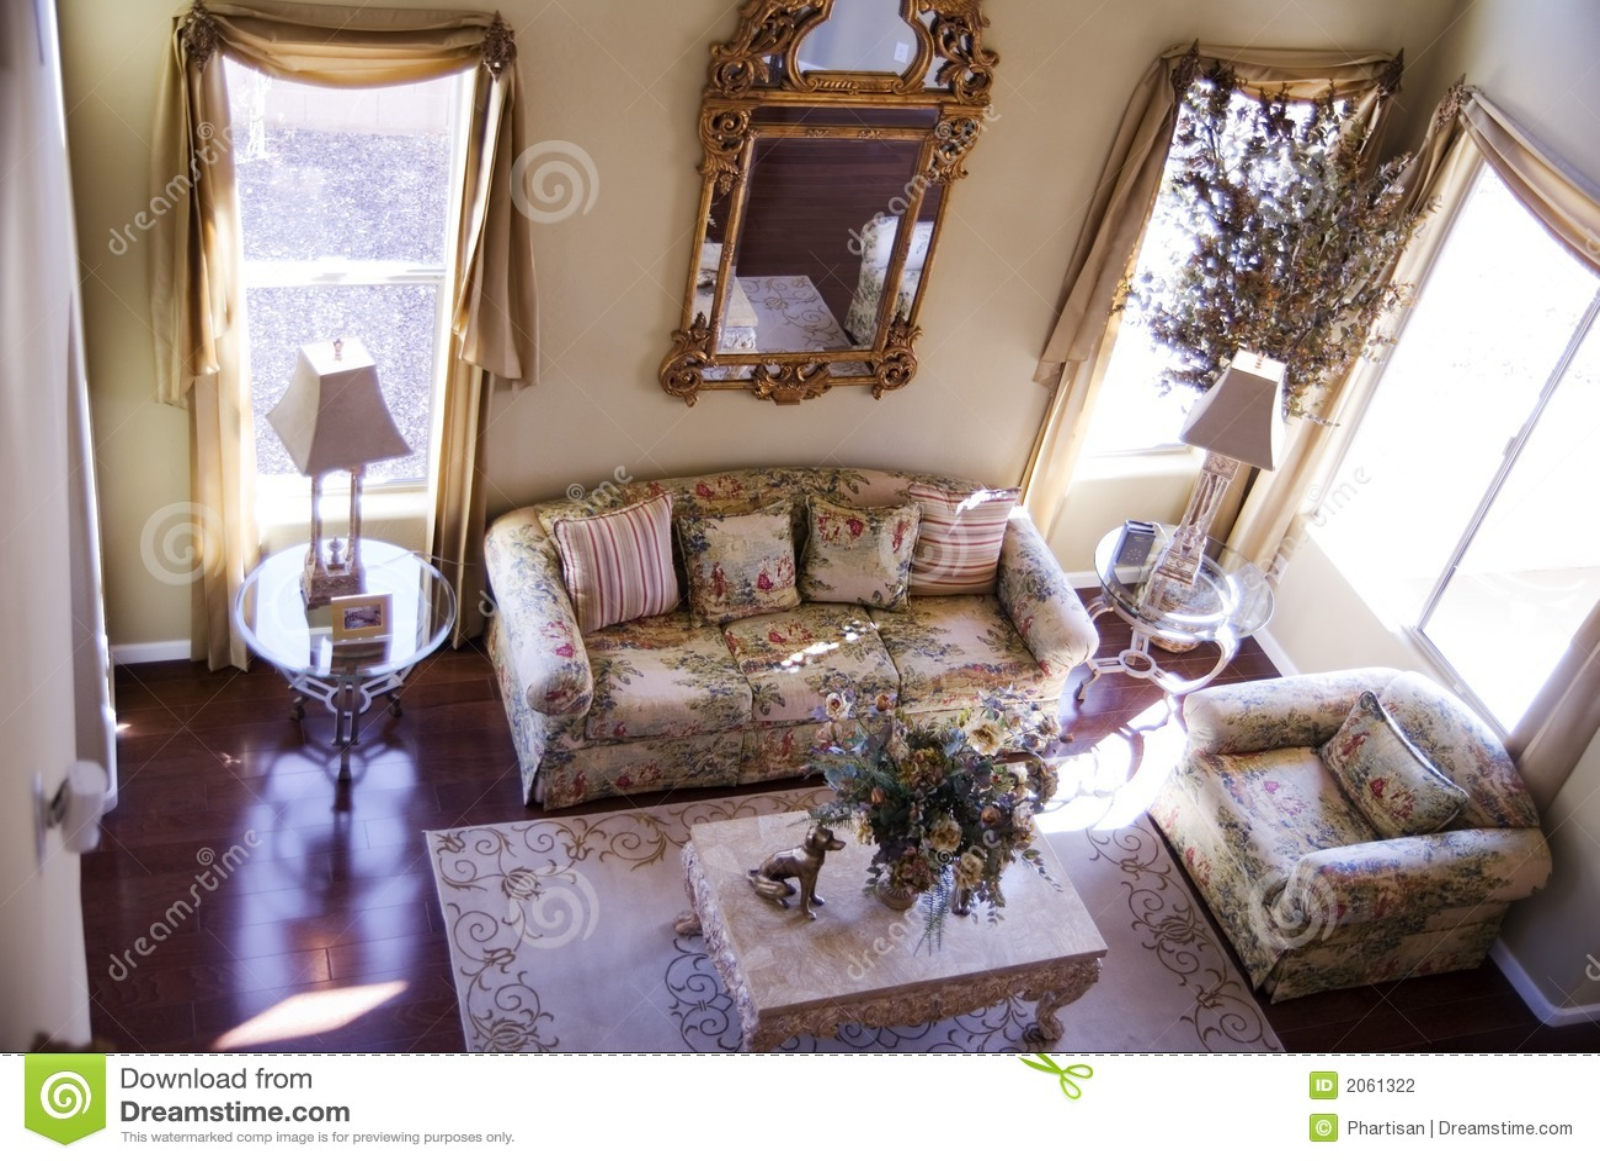 Fußbodenbelag Wohnzimmer ~ Fußbodenbelag wohnzimmer bodenbelag wohnzimmer beispiele offene